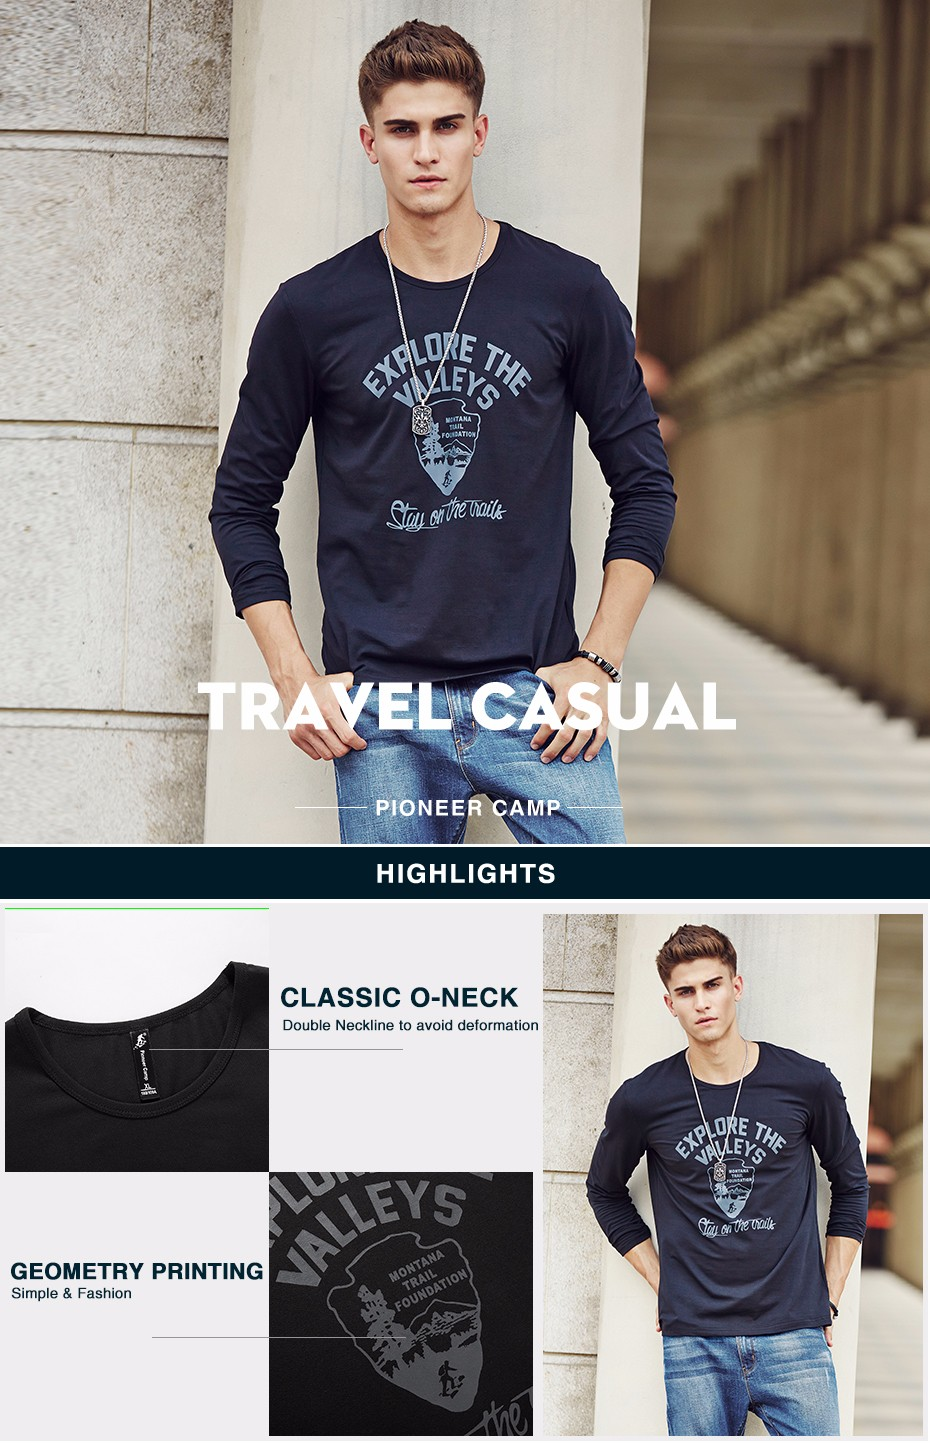 HTB1WE.AKVXXXXXkXFXXq6xXFXXXN - Pioneer Camp men Hot T shirt fashion brand clothing Men's Long Sleeve T Shirt Cotton Elastic Casual T-Shirt Male 4XL plus size